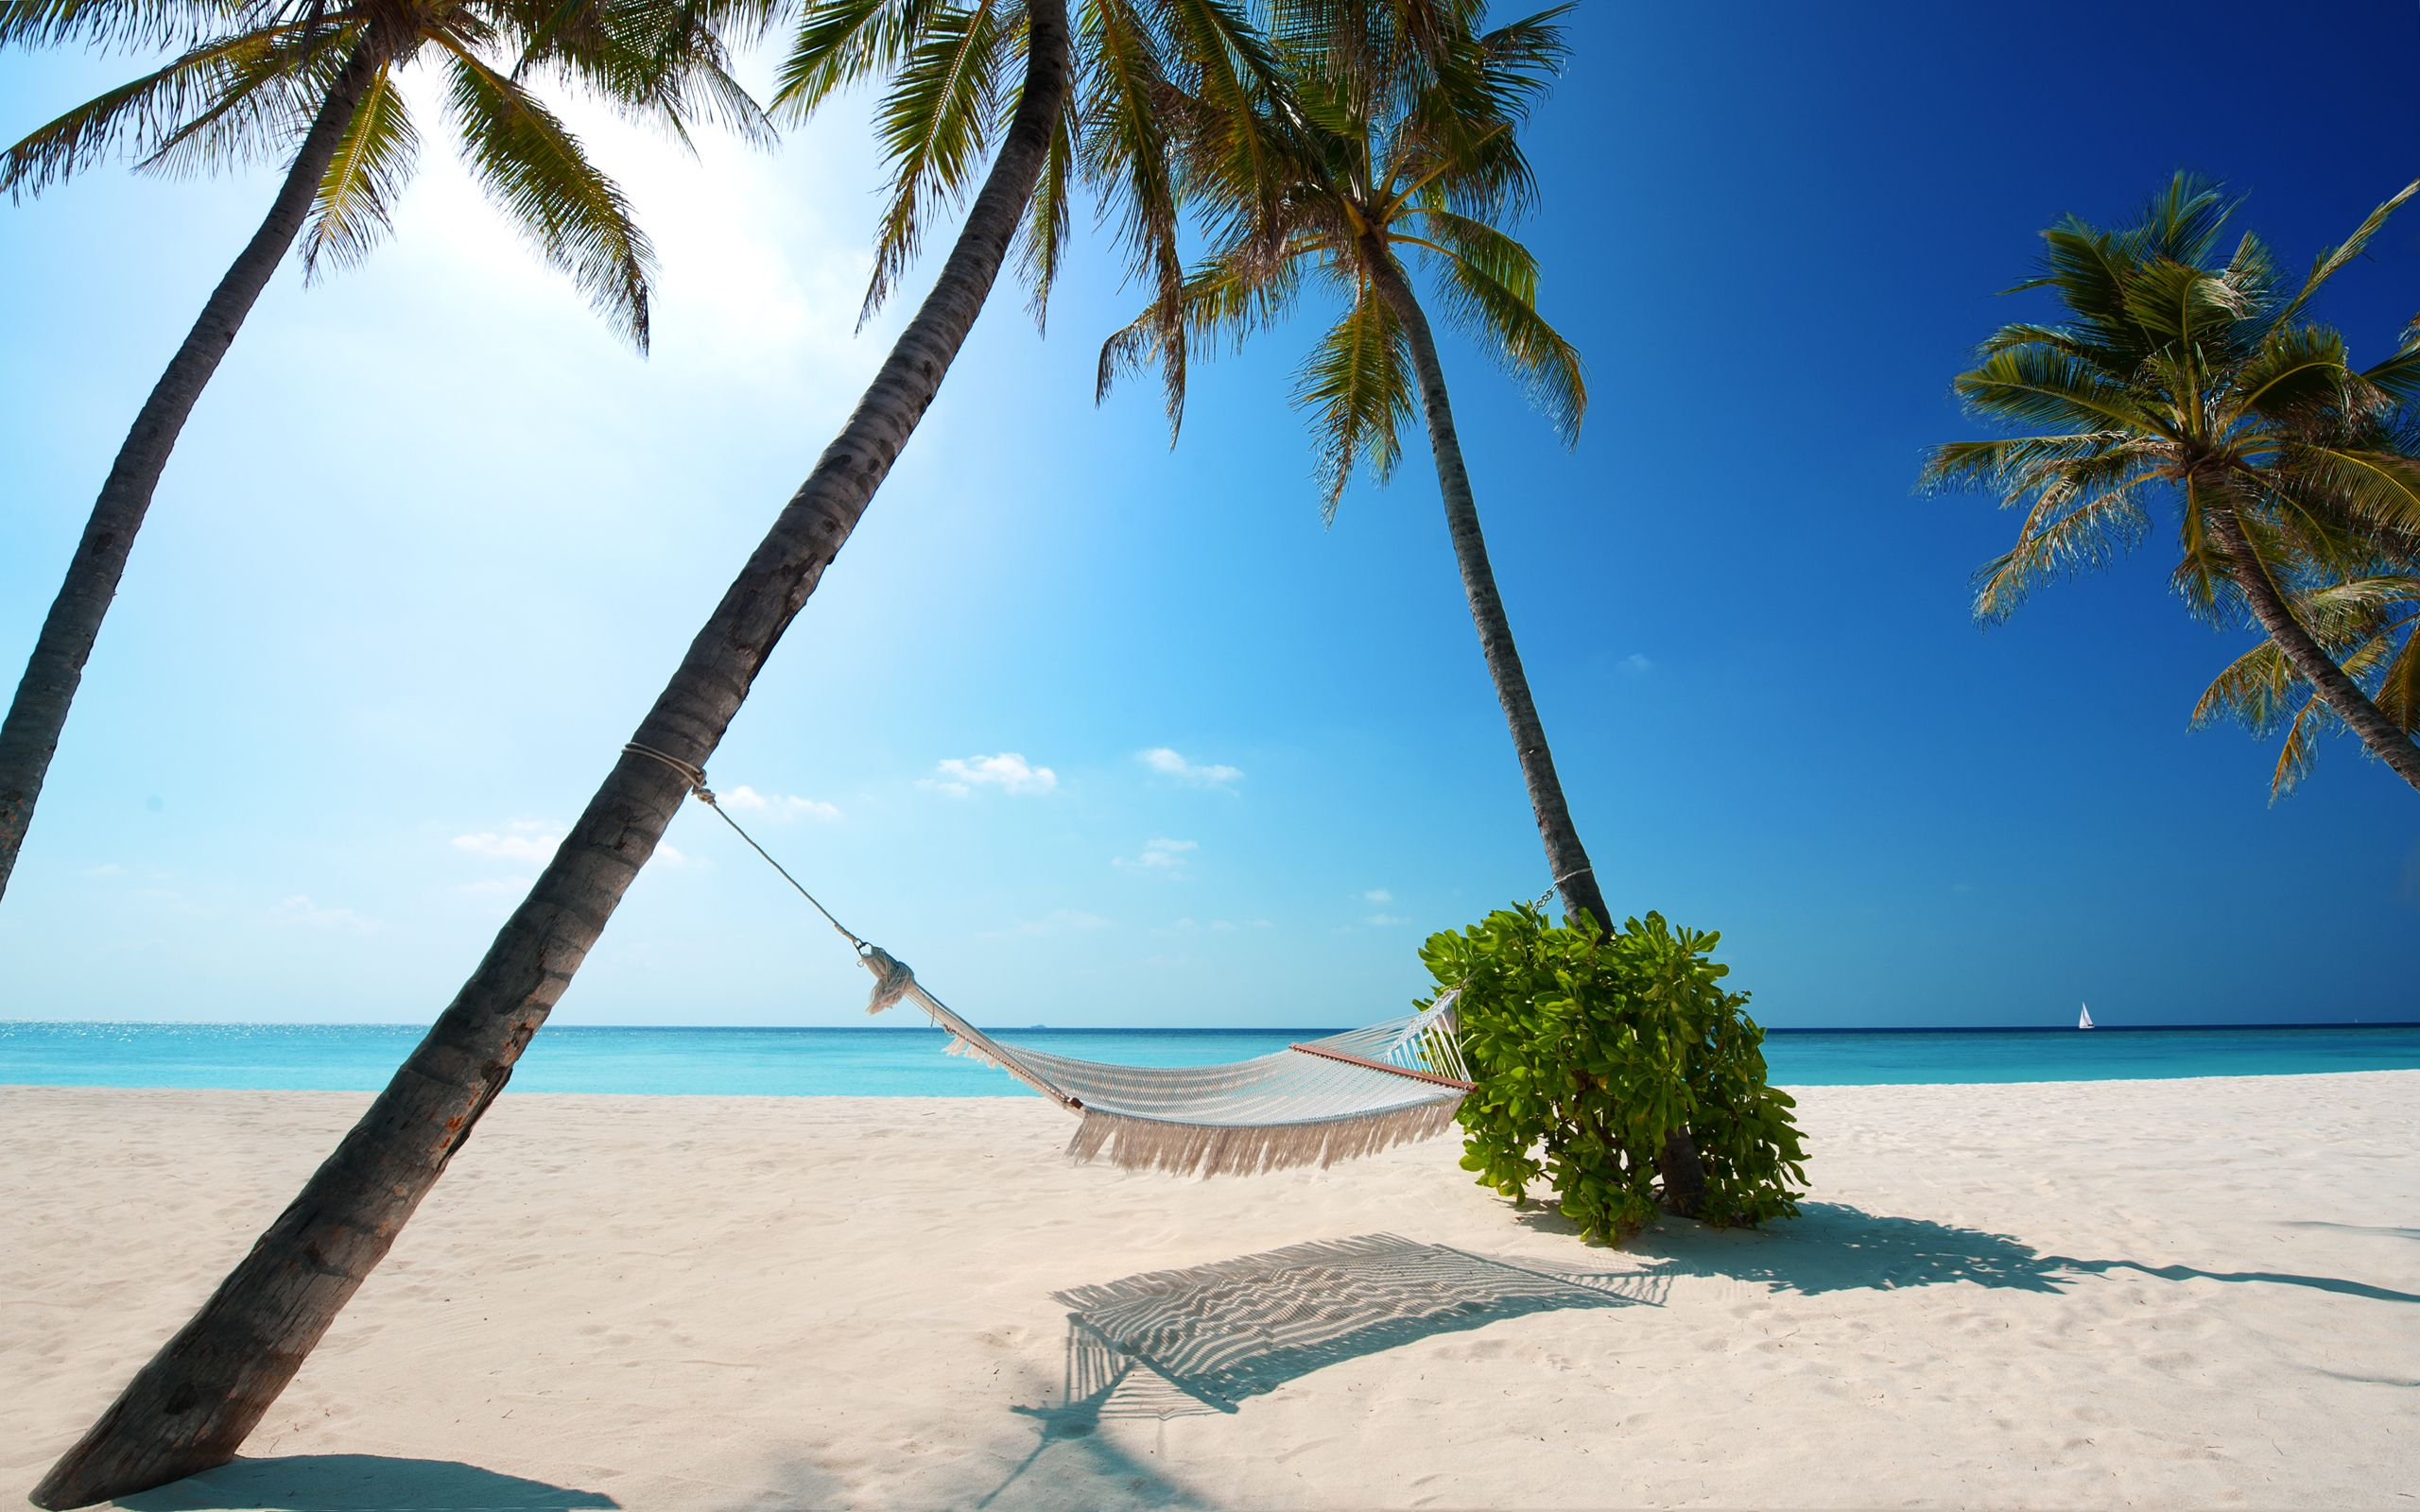 Beautiful Vacation Wallpapers   Top Beautiful Vacation 2560x1600